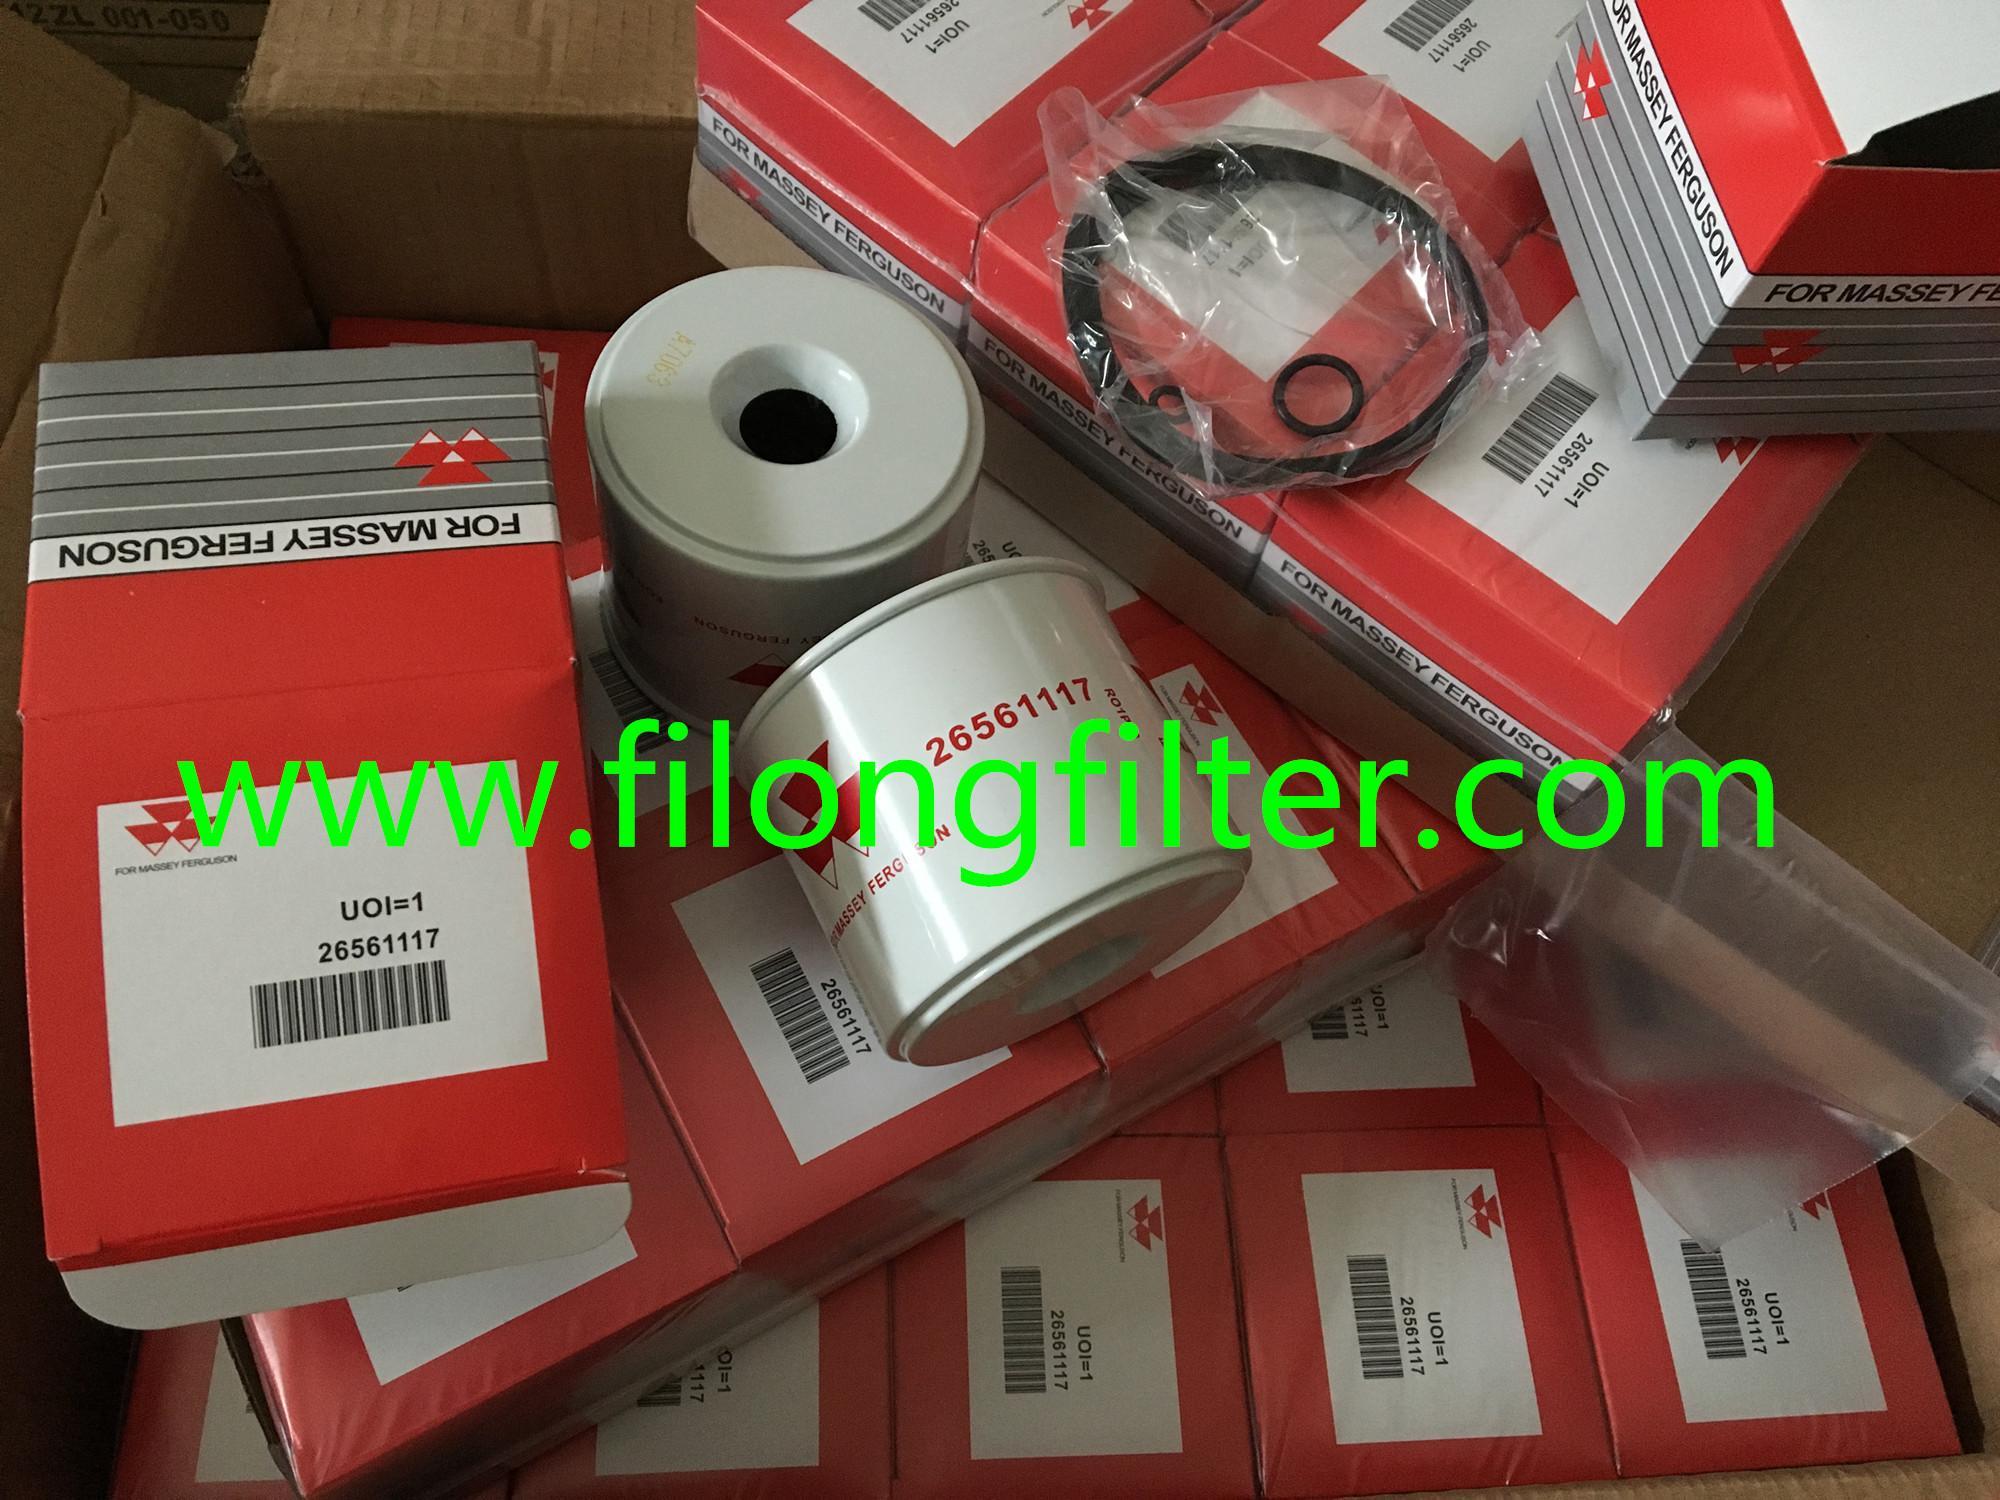 FILONG Manufactory For Mitsubishi Oil filter FOR MASSEY FERGUSON 26561117